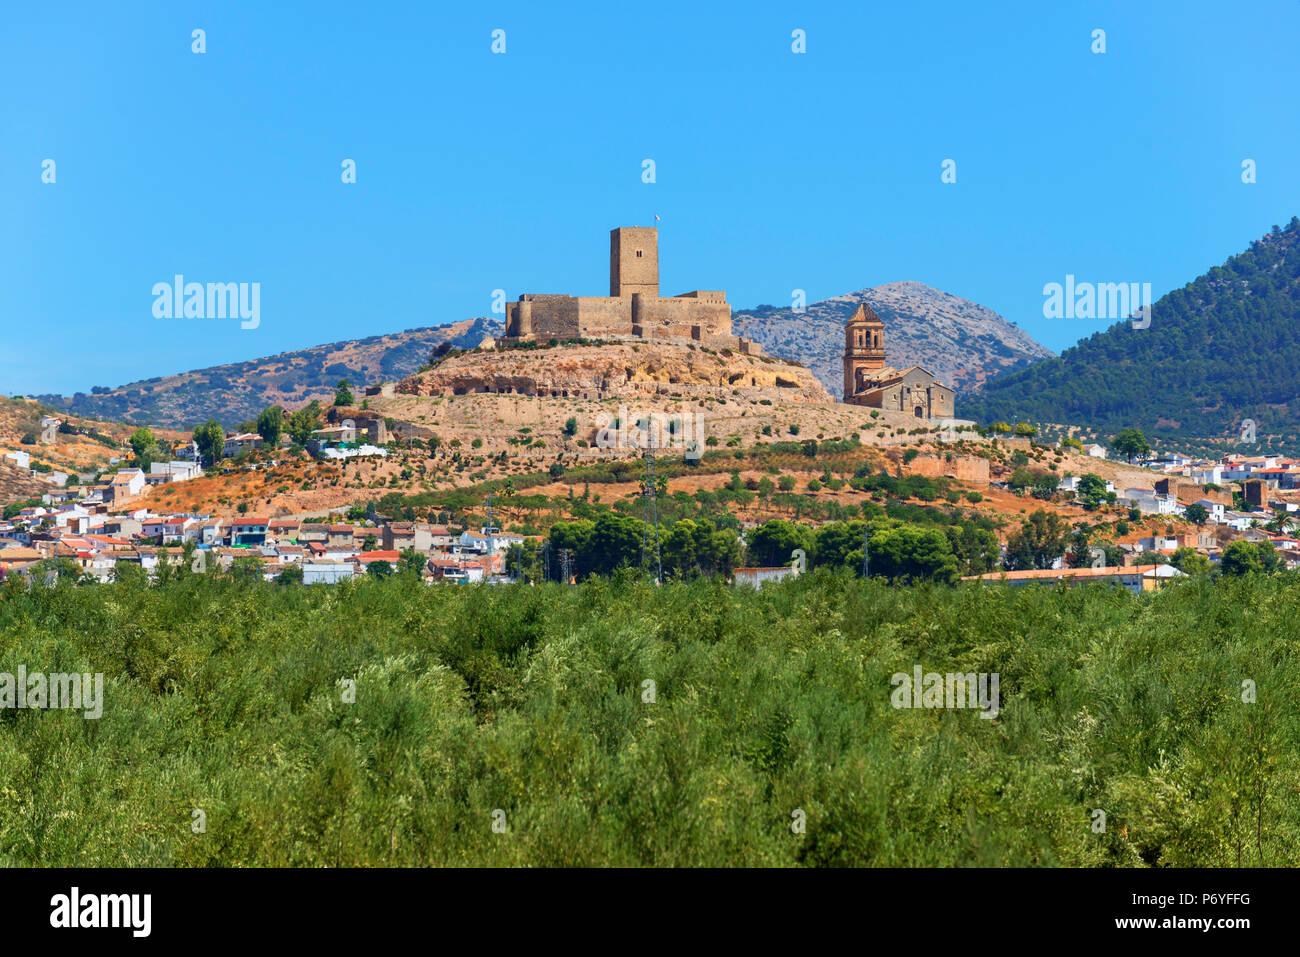 Blick auf Palma del Río mit Schloss, Andalusien, Spanien Stockfoto